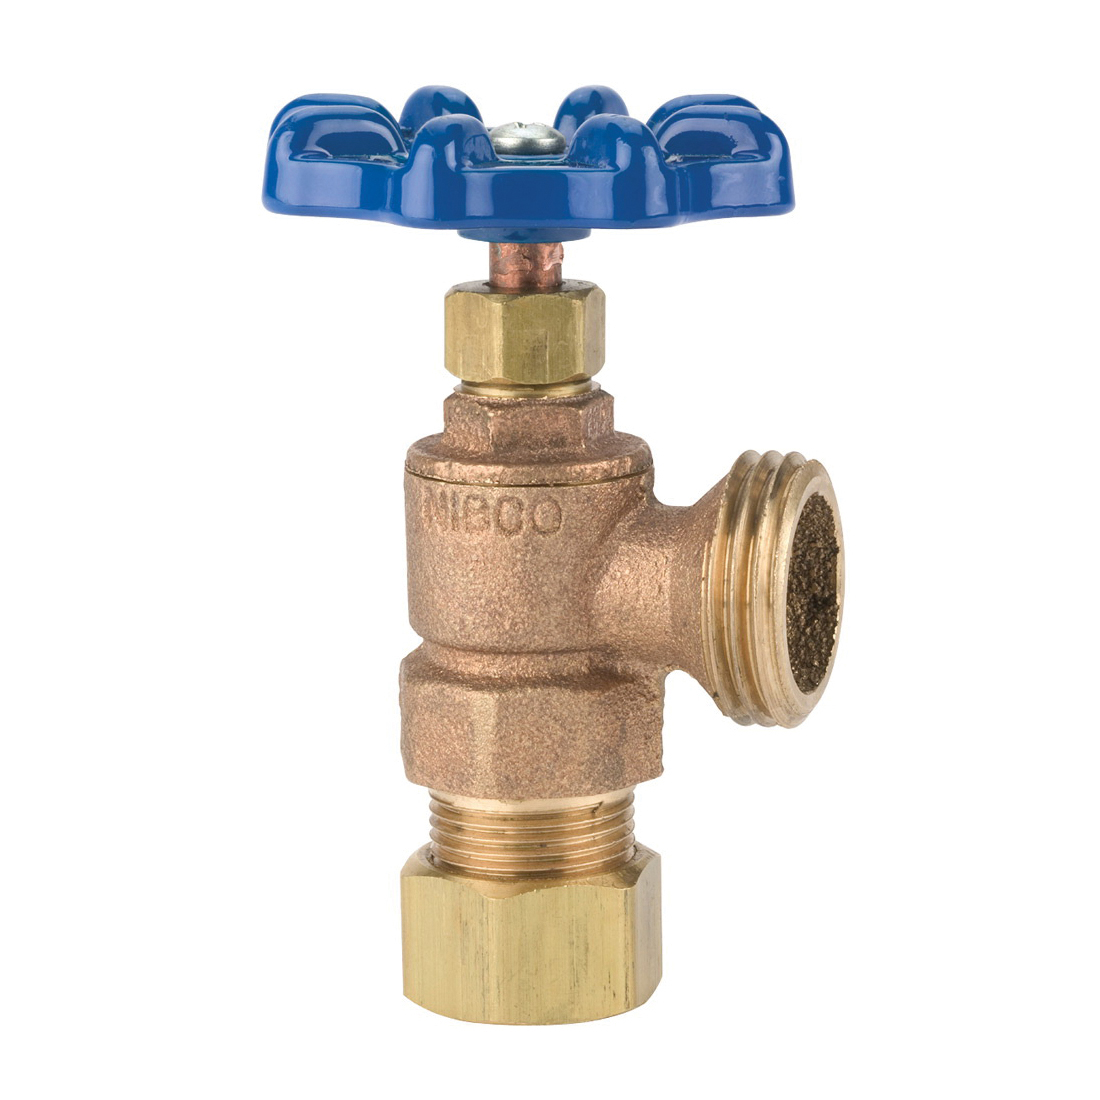 NIBCO® N53LEP6 4464 Multi-Turn Boiler Drain Valve, 1/2 in Nominal, Compression x Hose End Style, 125 psi Pressure, Bronze Body, Import